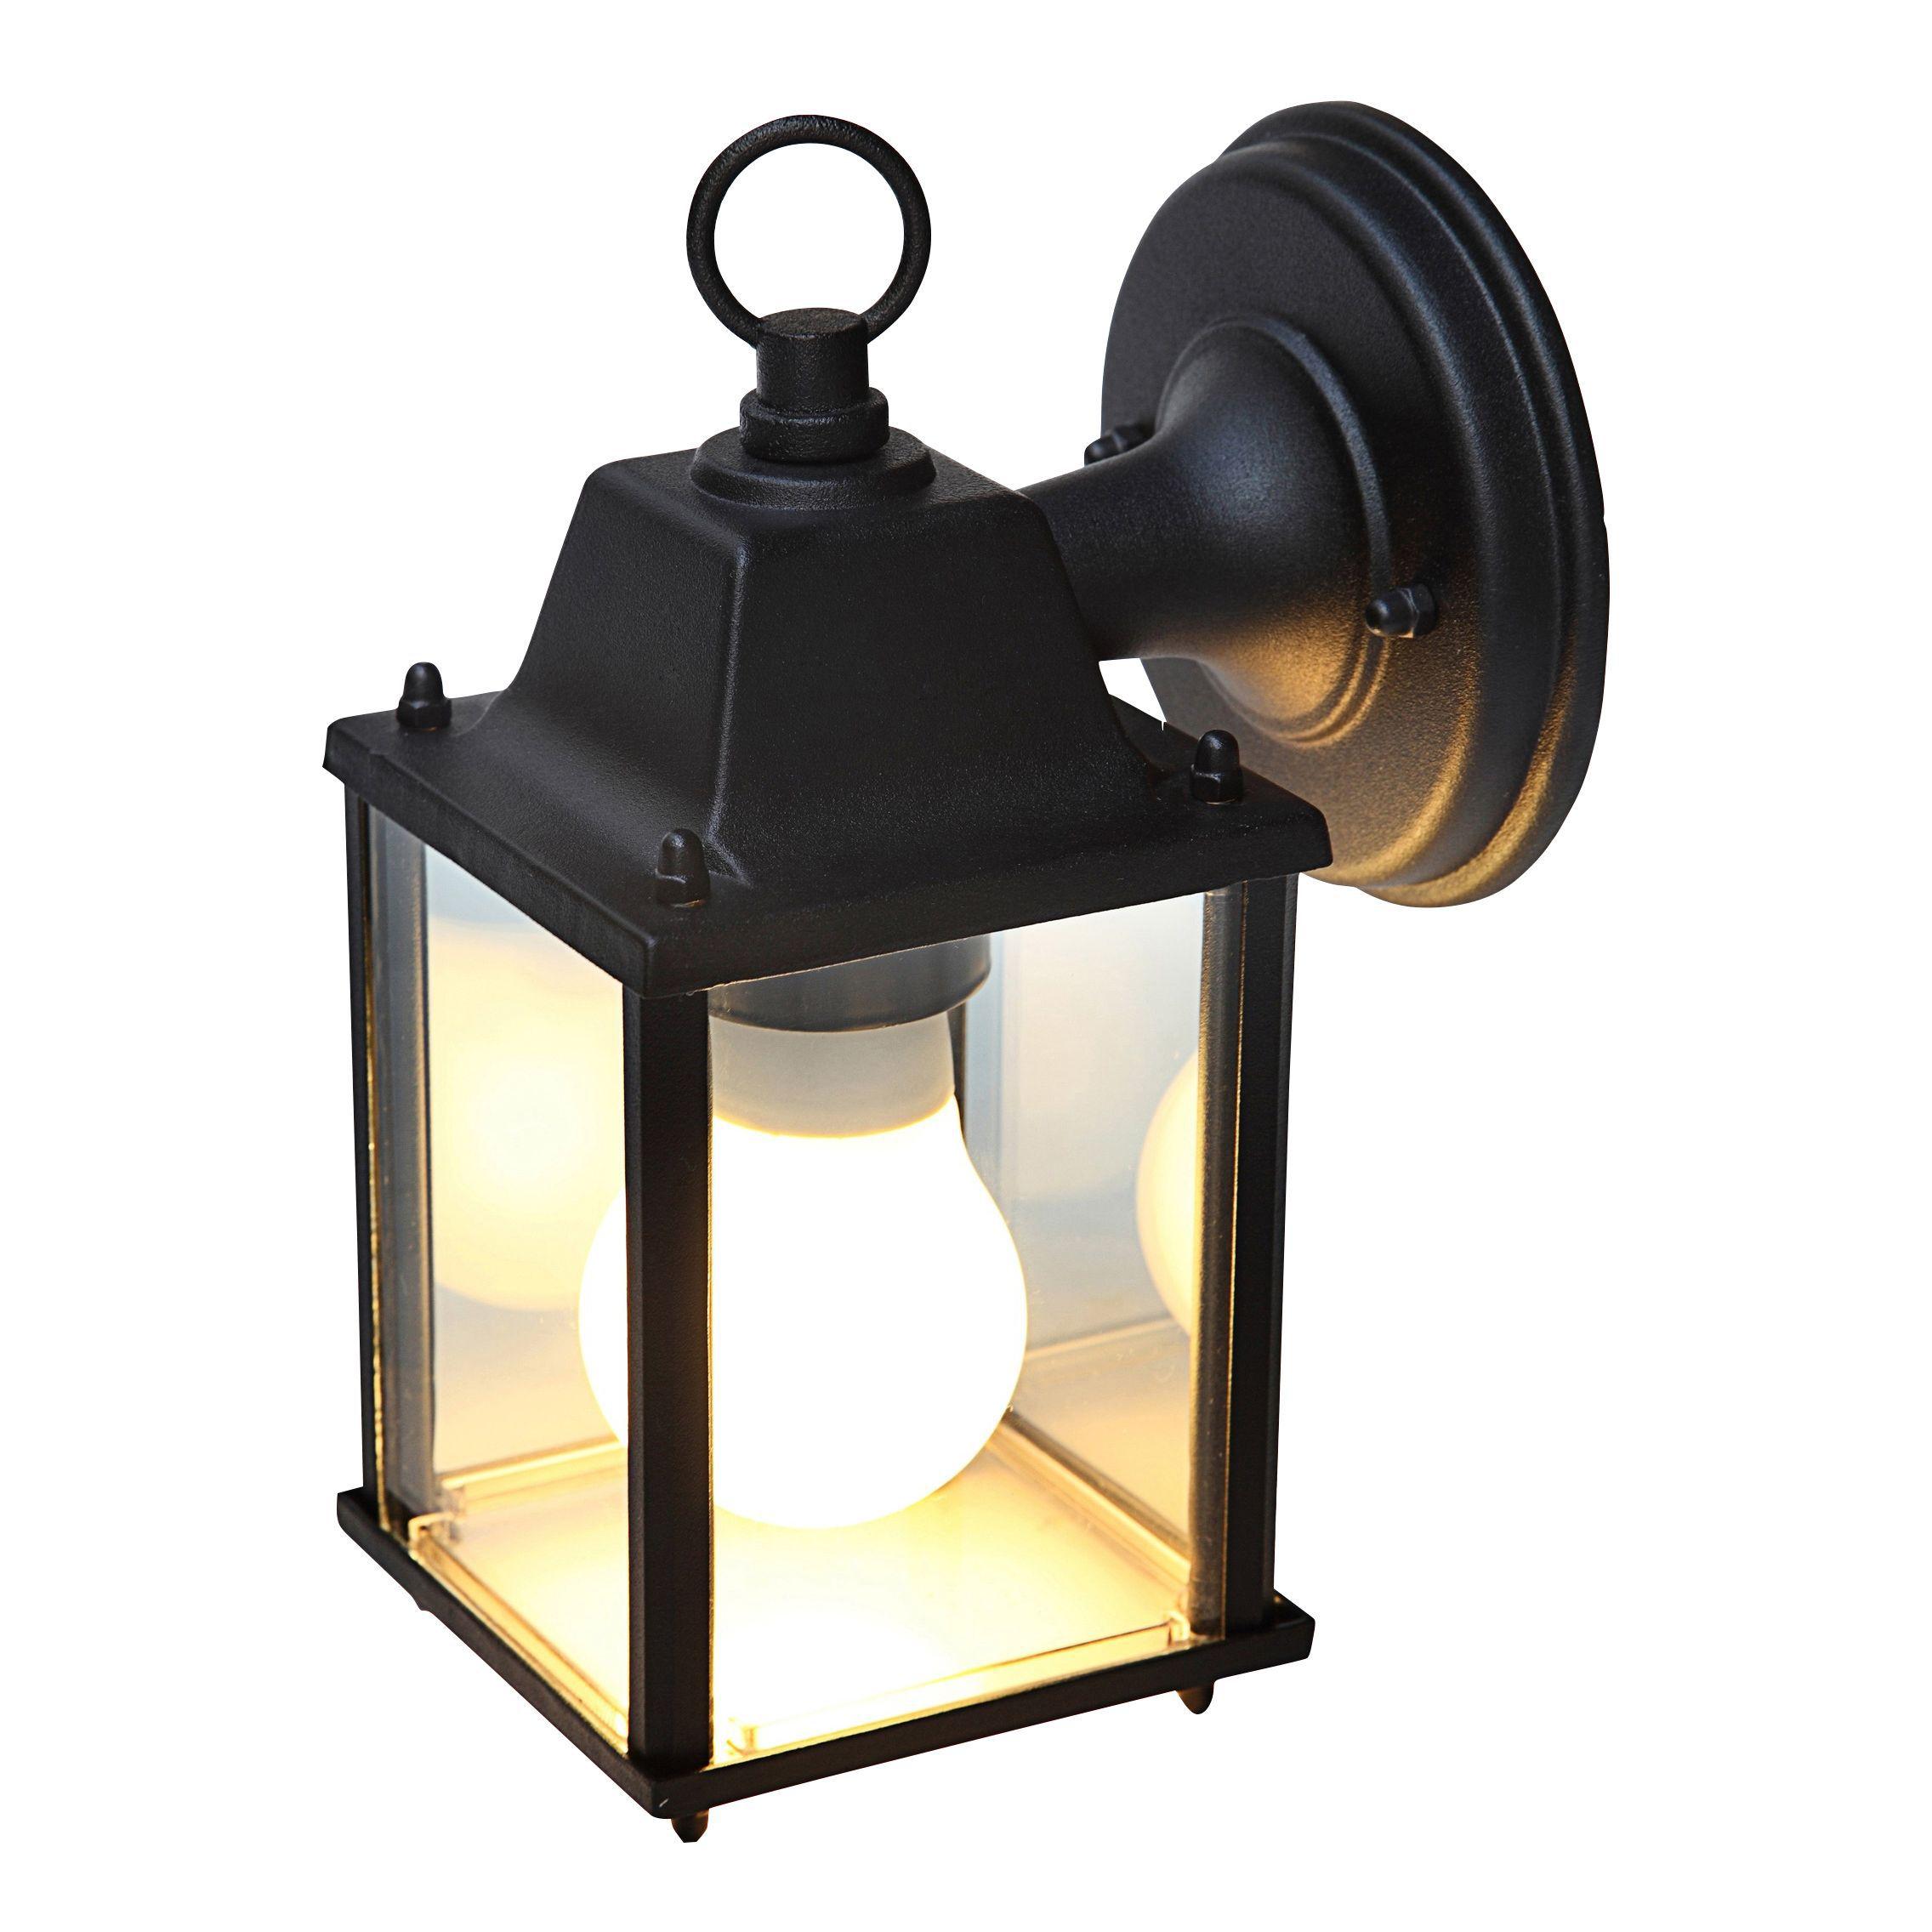 Blooma Sollies Black Mains Powered External Wall Light